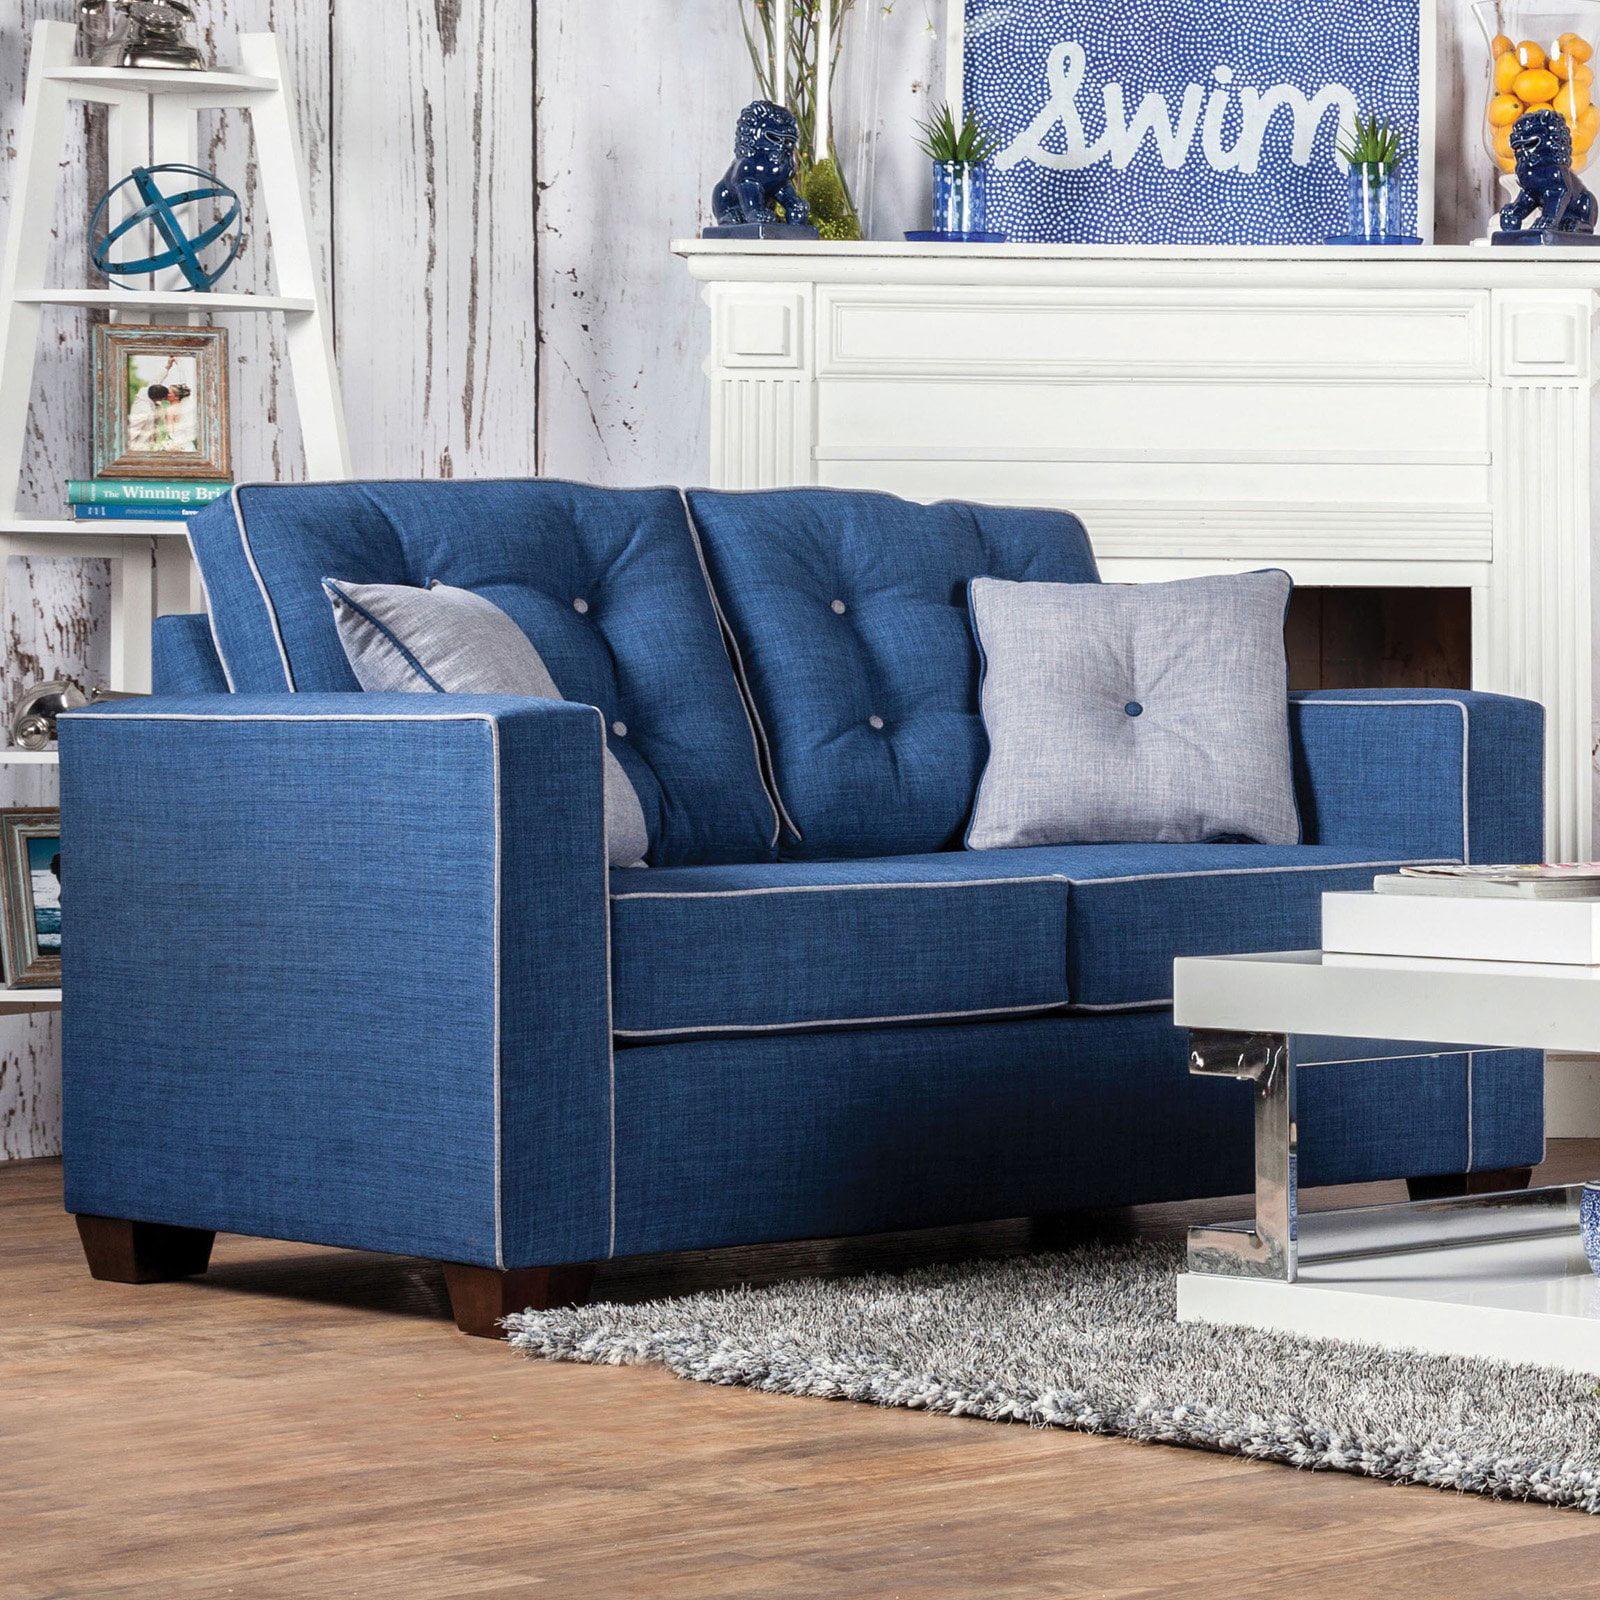 Furniture of America Rinella Contrasting Welt Trim Loveseat